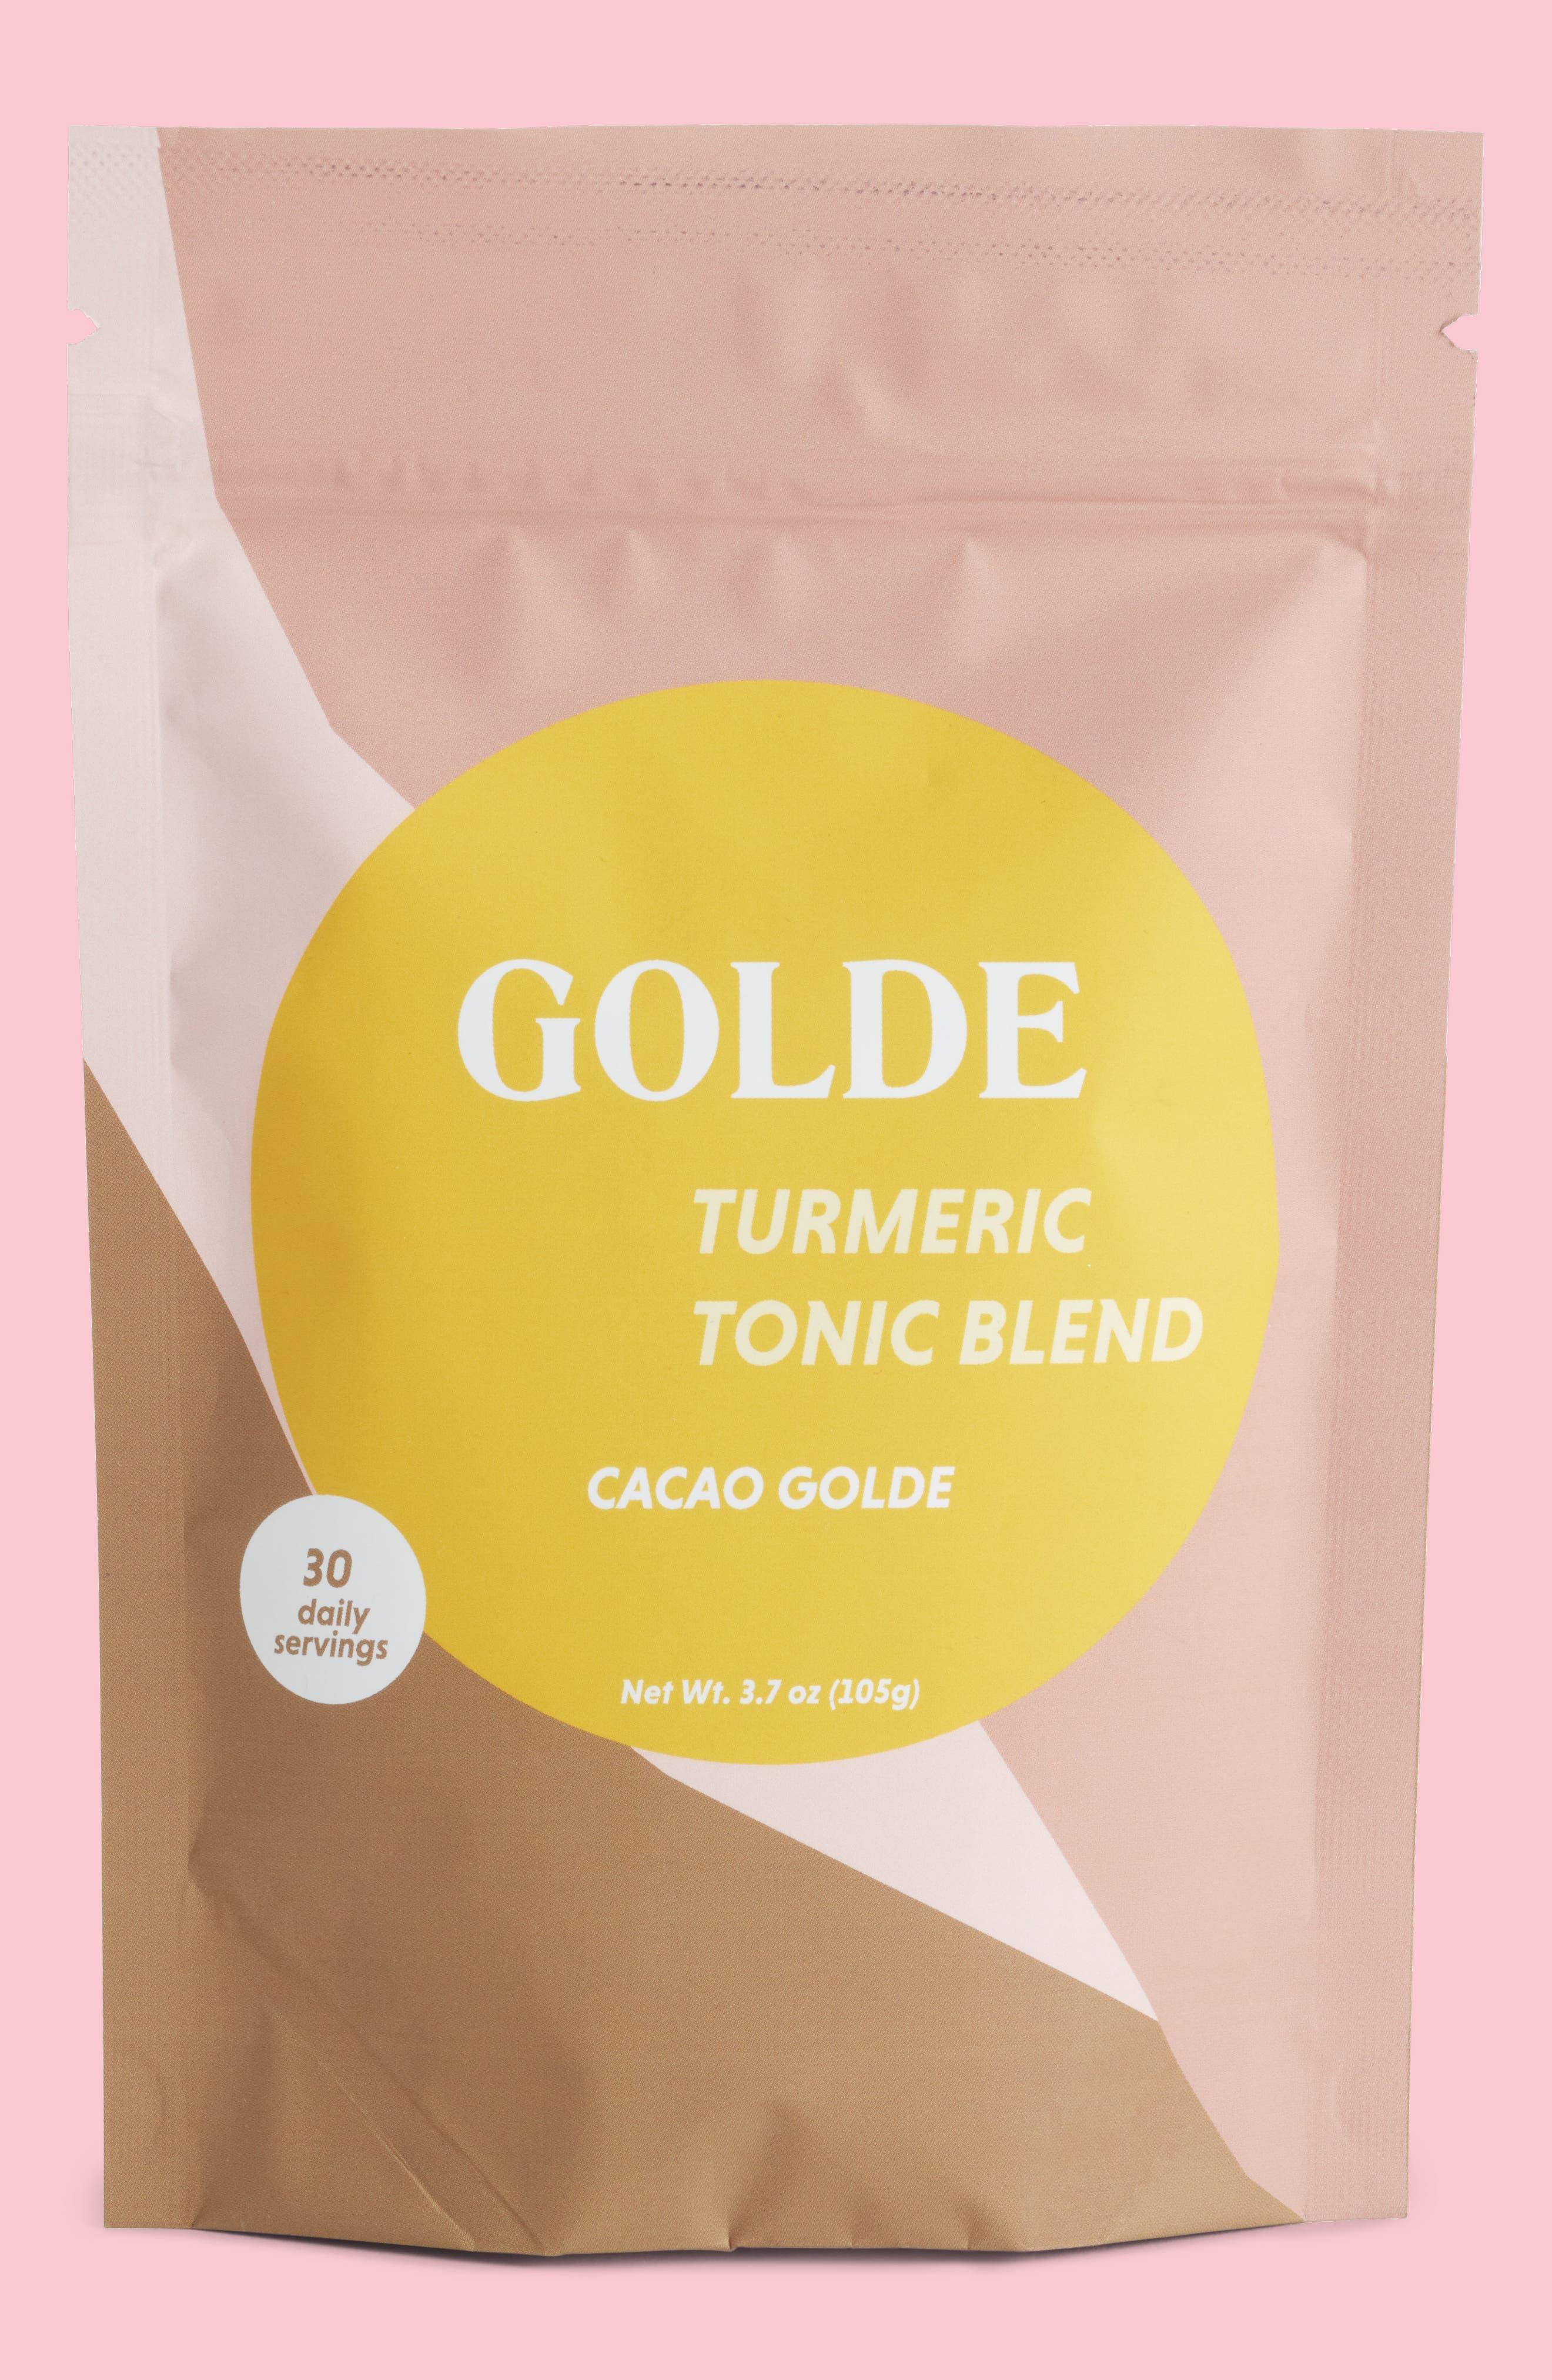 Golde Cacao Golde Turmeric Tonic Blend,                             Main thumbnail 1, color,                             None